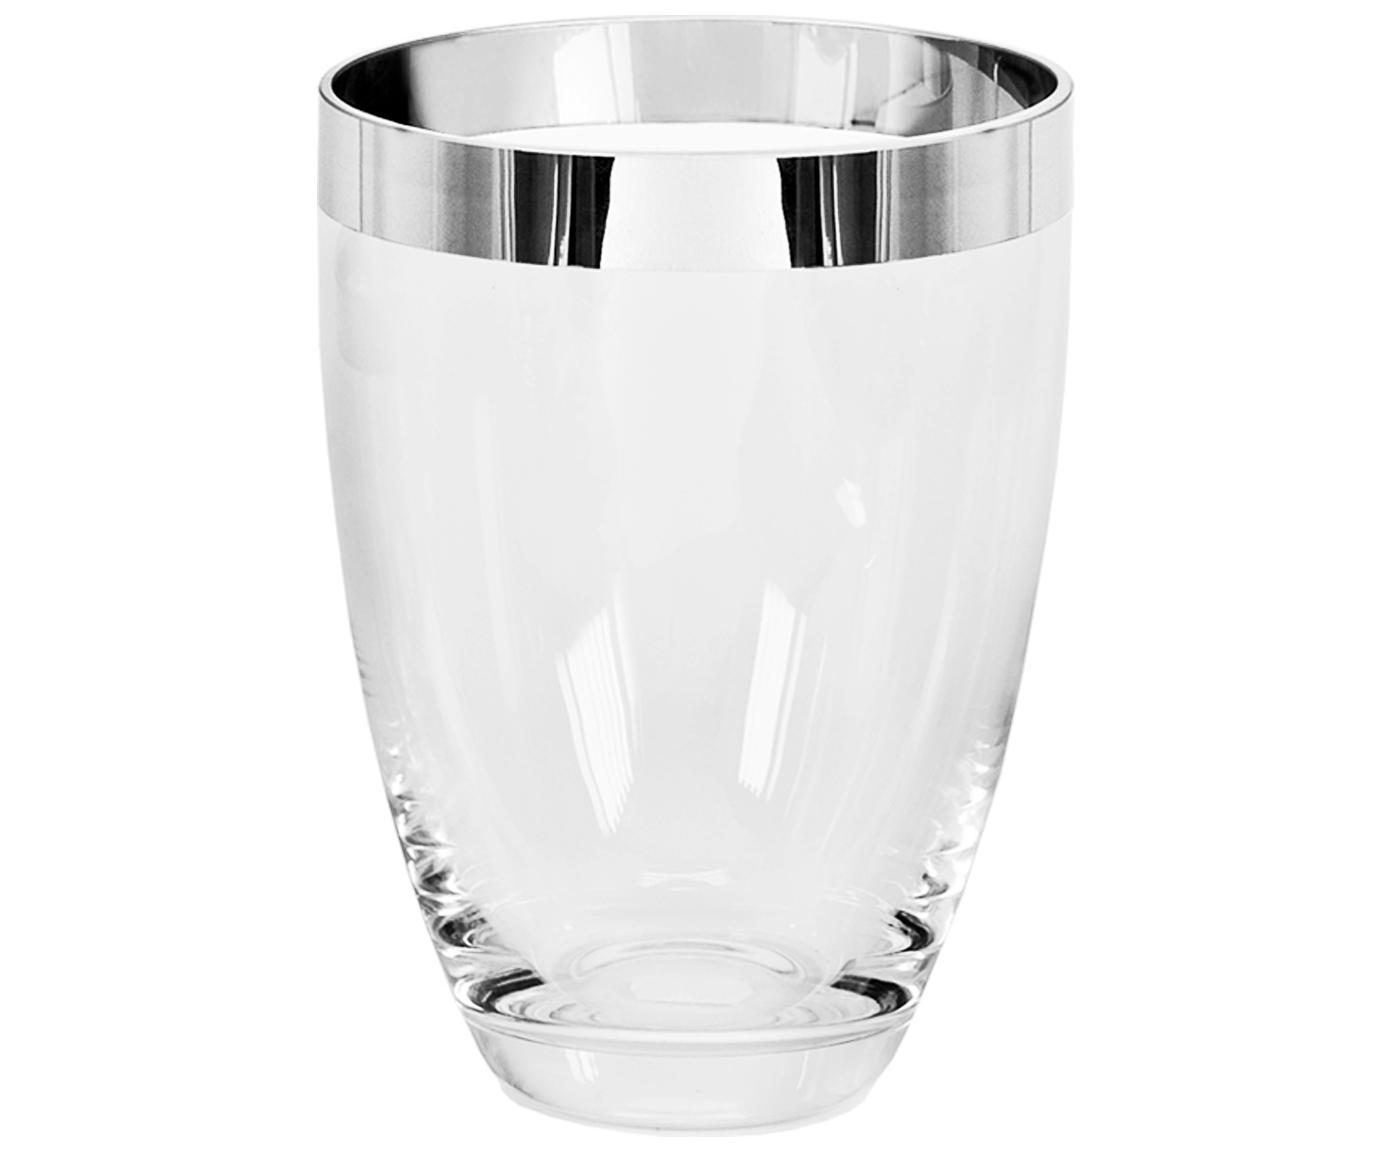 Mundgeblasene Vase Charlotte aus Platinglas, Platinglas, Transparent, Ø 15 x H 20 cm